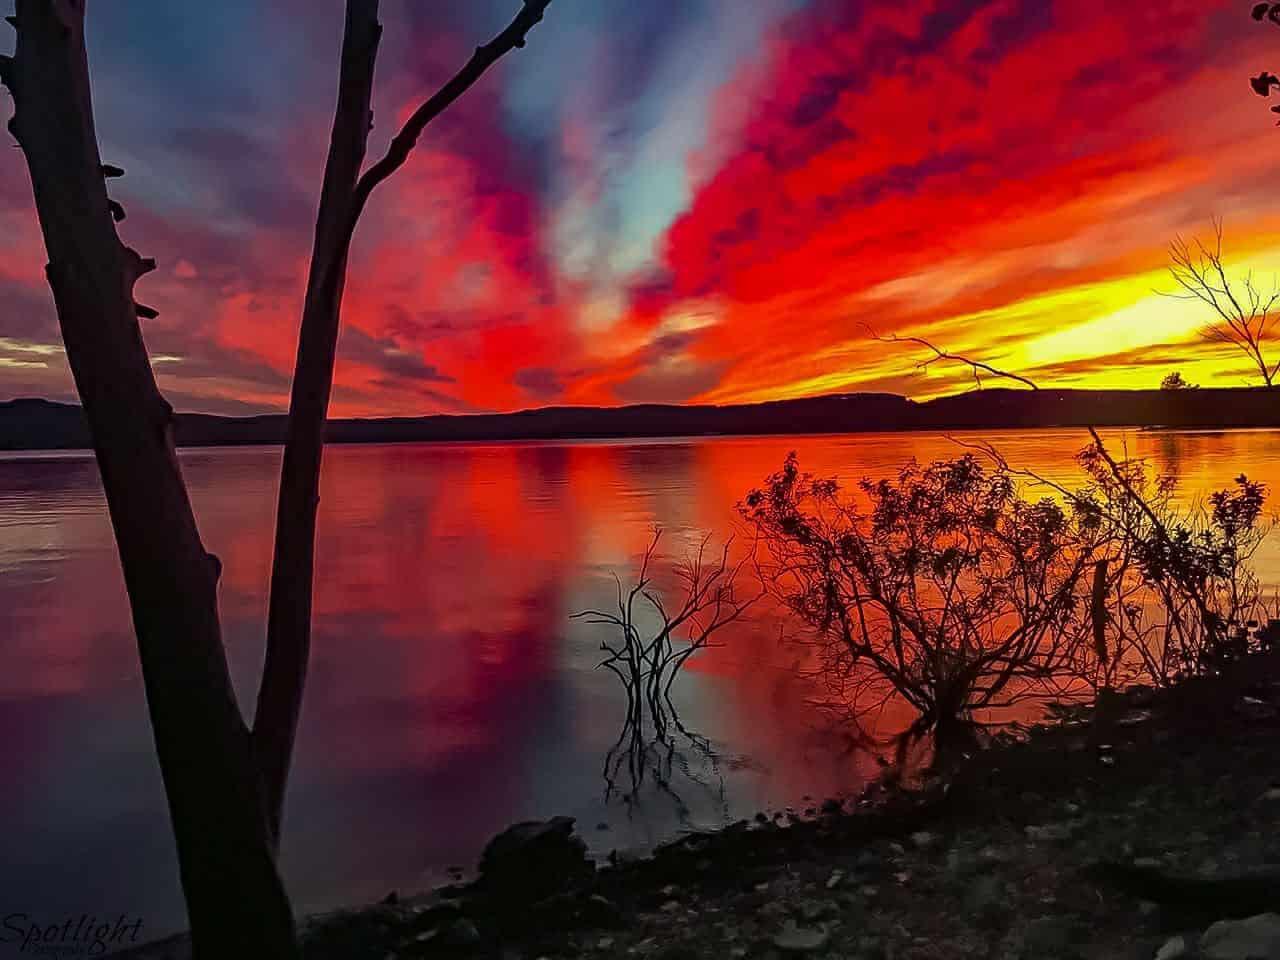 Sunset over Branson mo. Taken last year